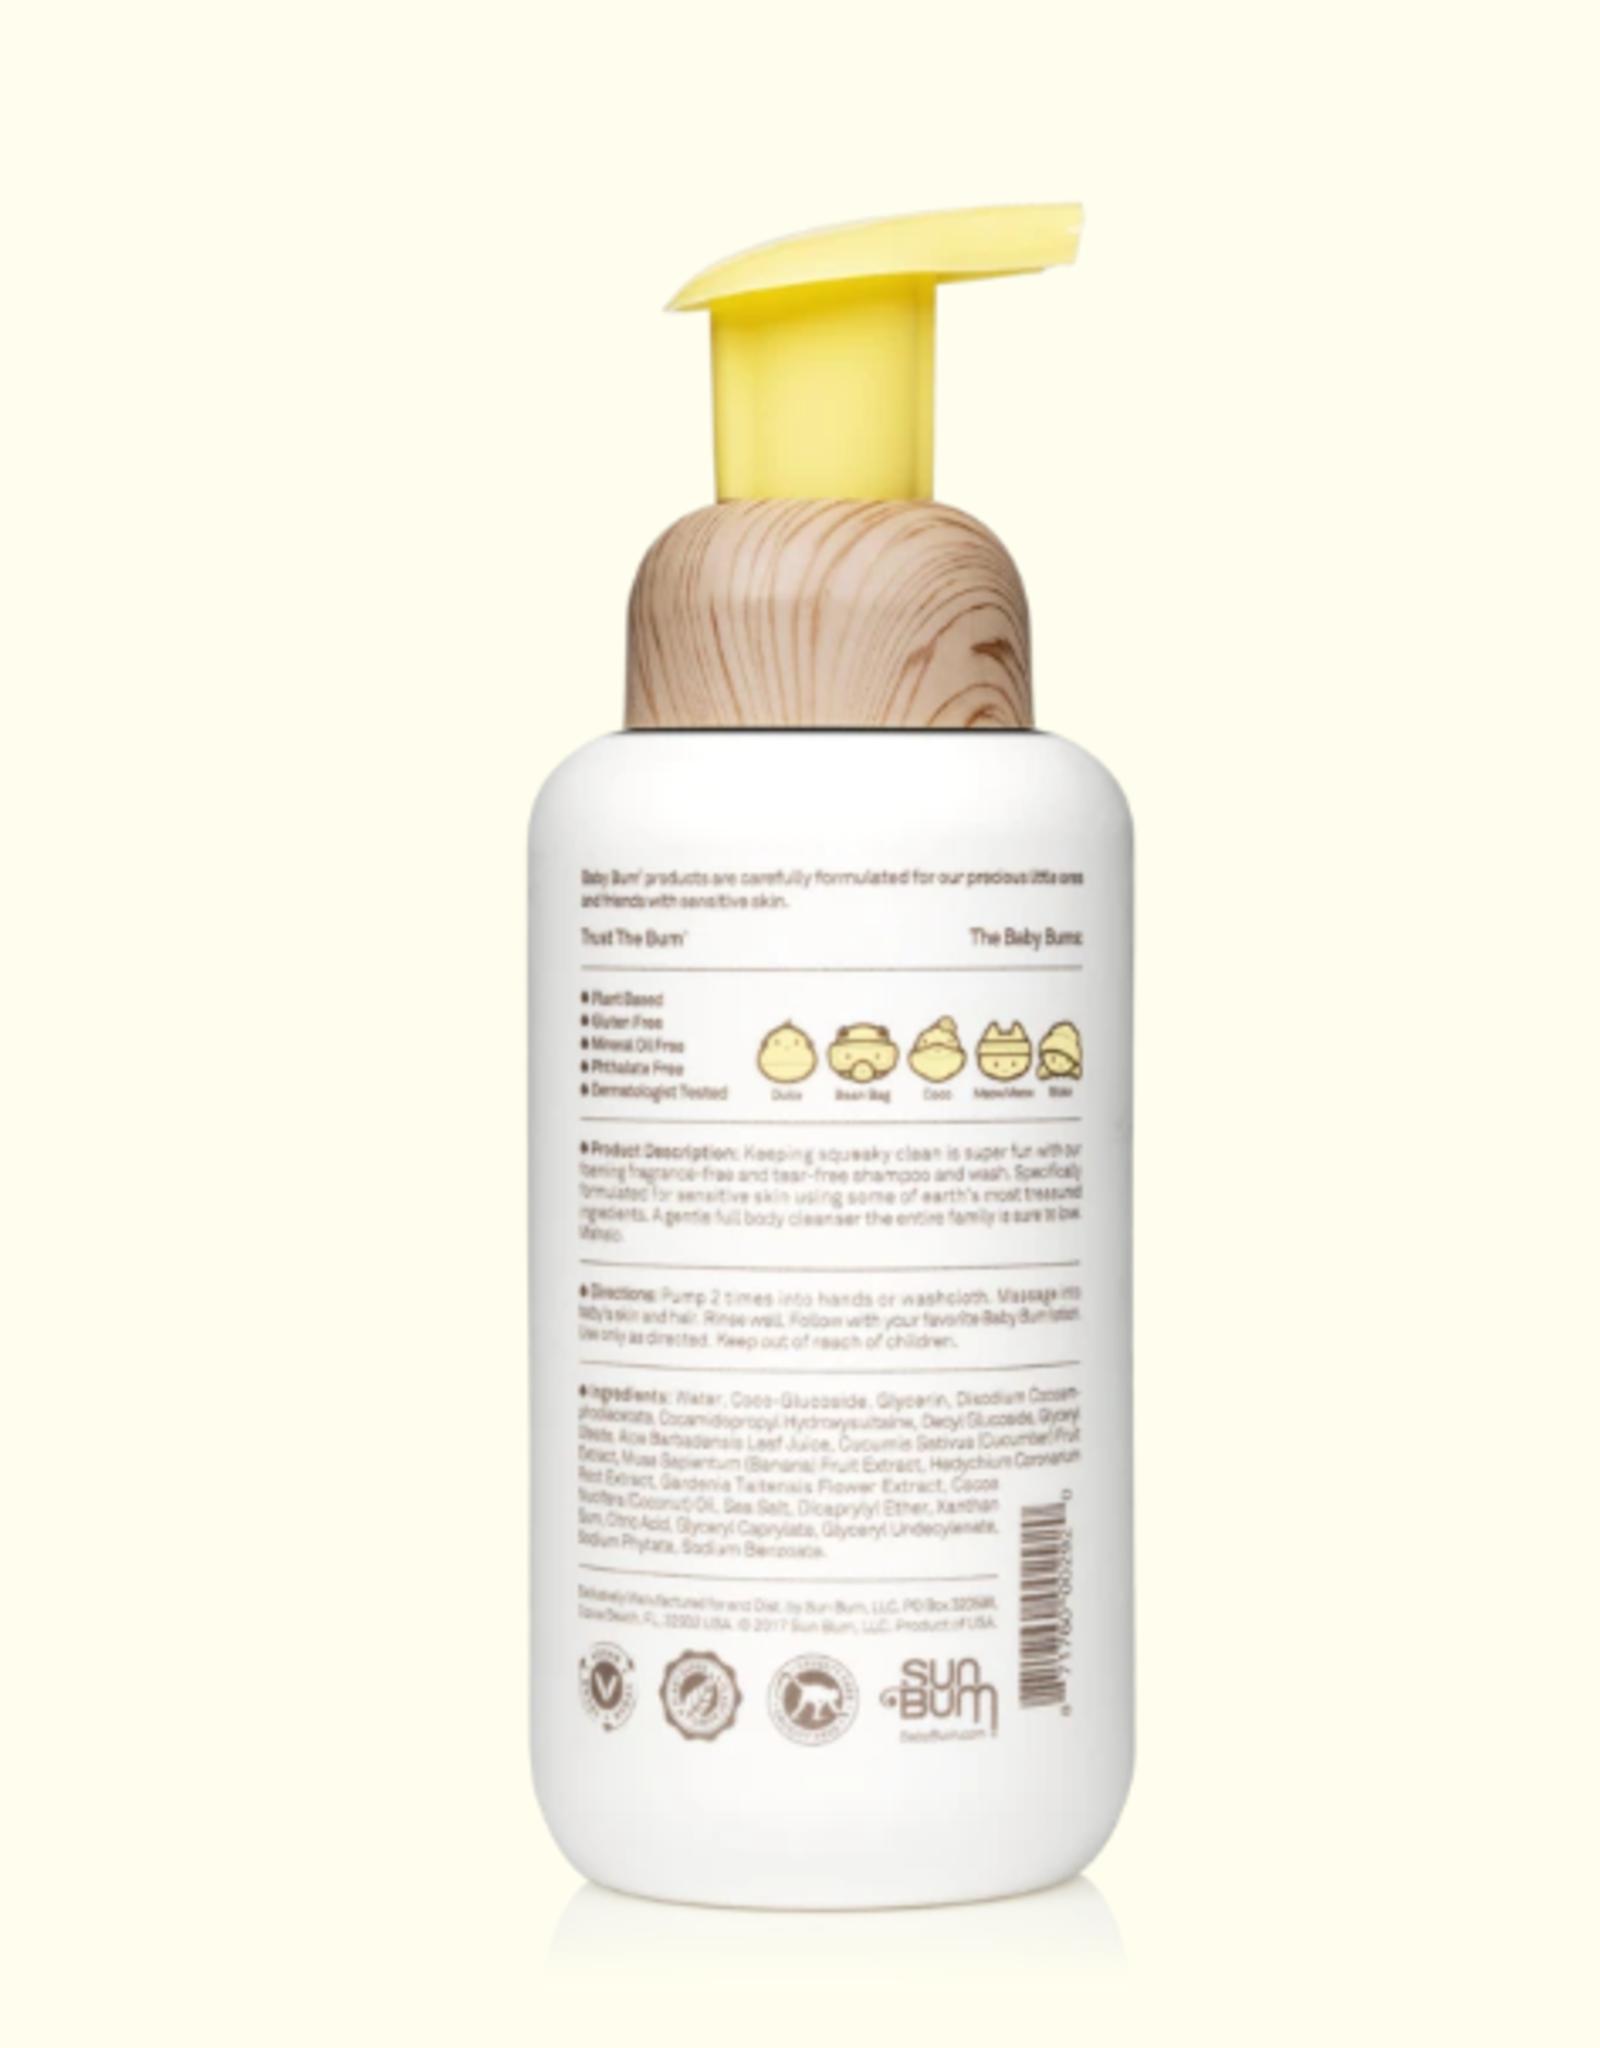 Sun Bum Baby Bum Foaming Shampoo & Wash Natural 12 oz.